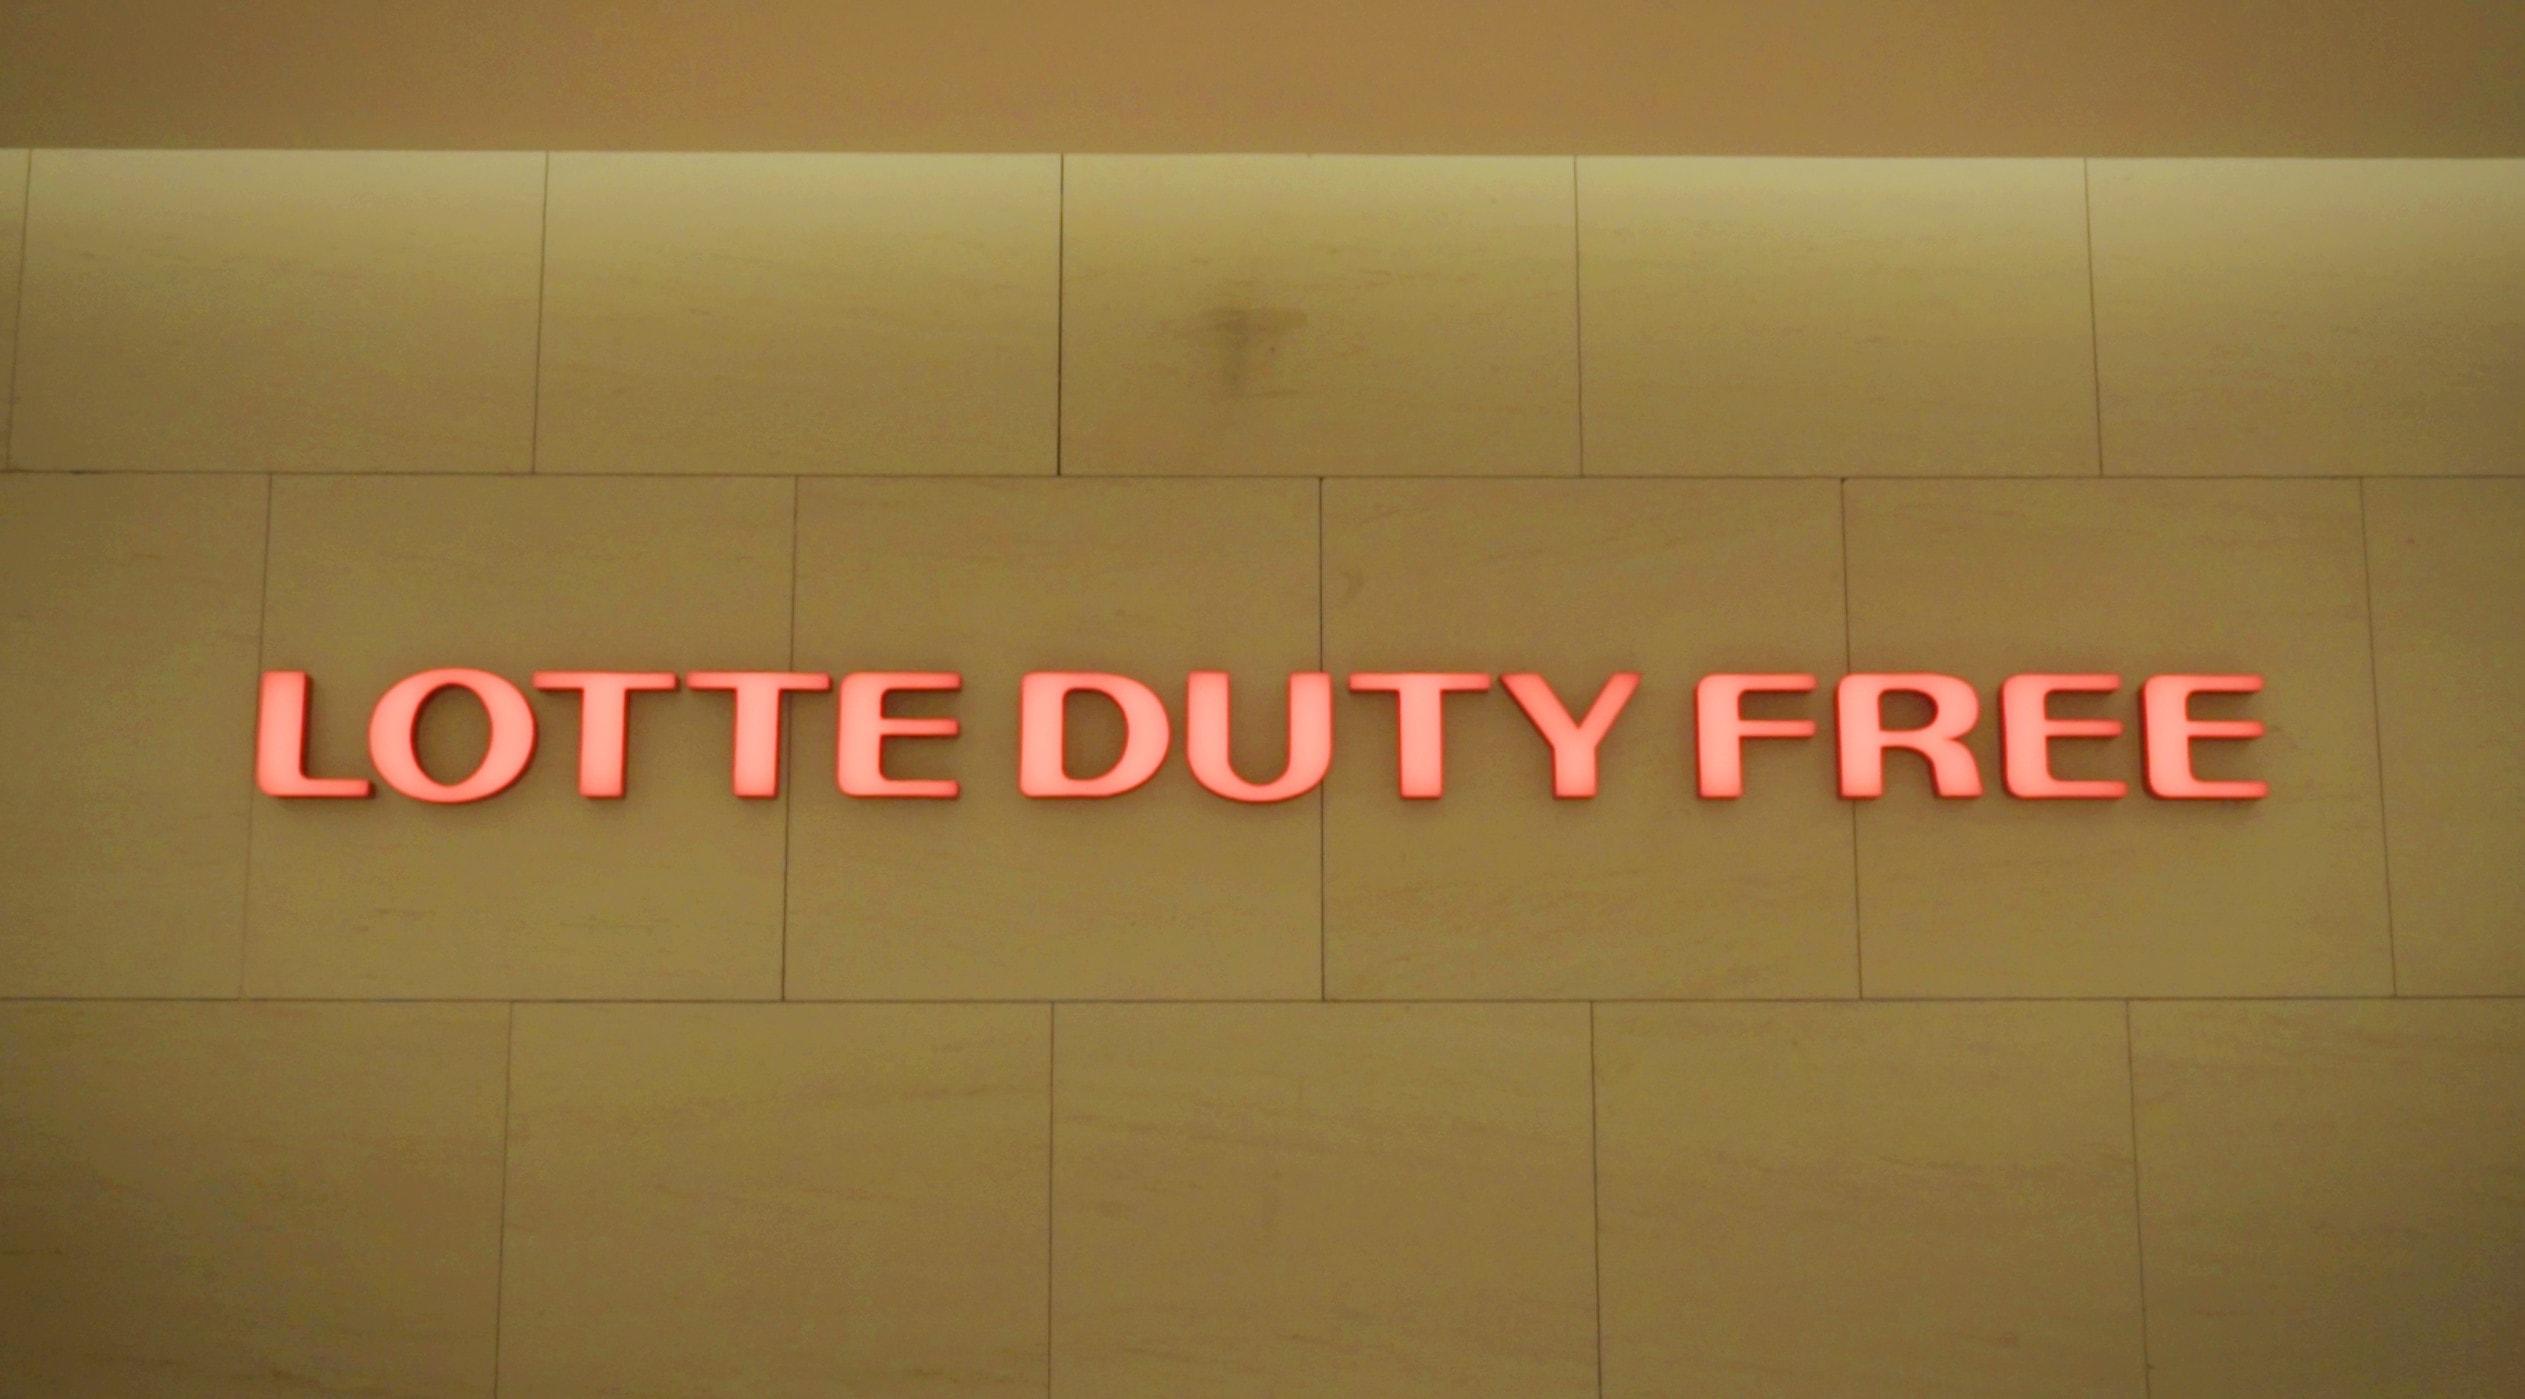 BILLY COLEEN SEOUL SOUTH KOREA lotte duty free